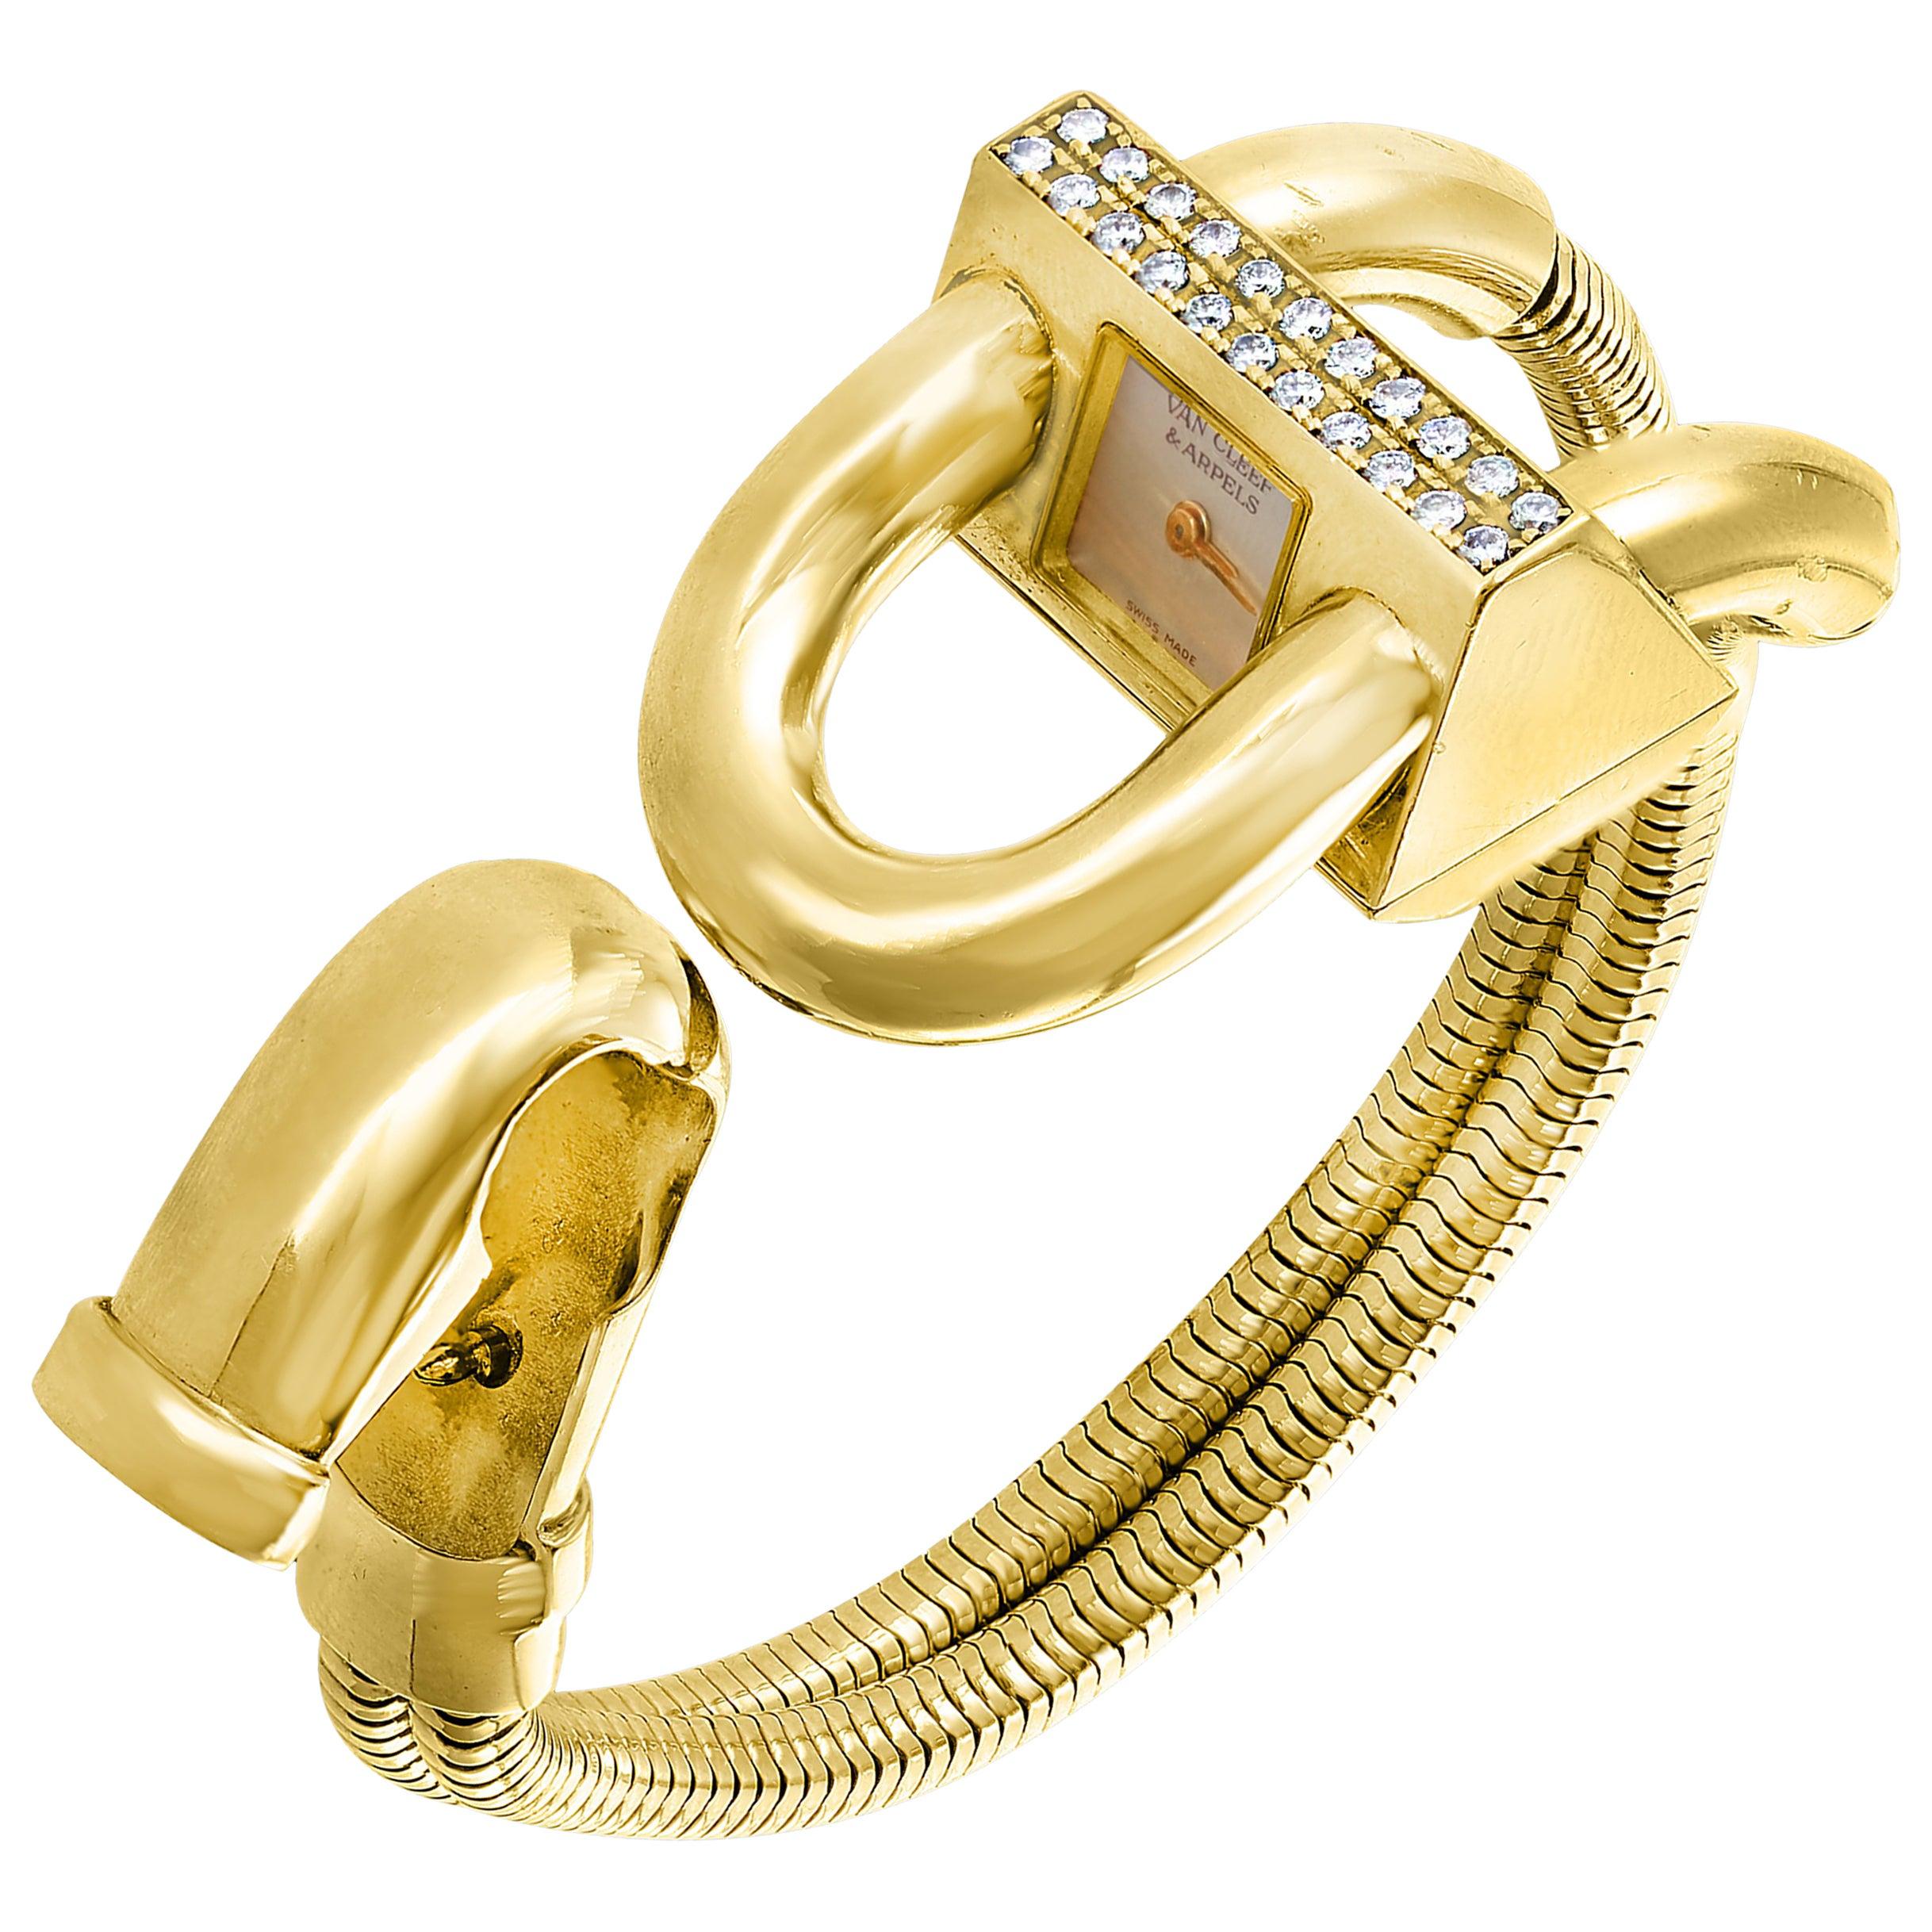 Van Cleef & Arpels Yellow Gold Diamond Cadenas Bracelet Wristwatch, Estate